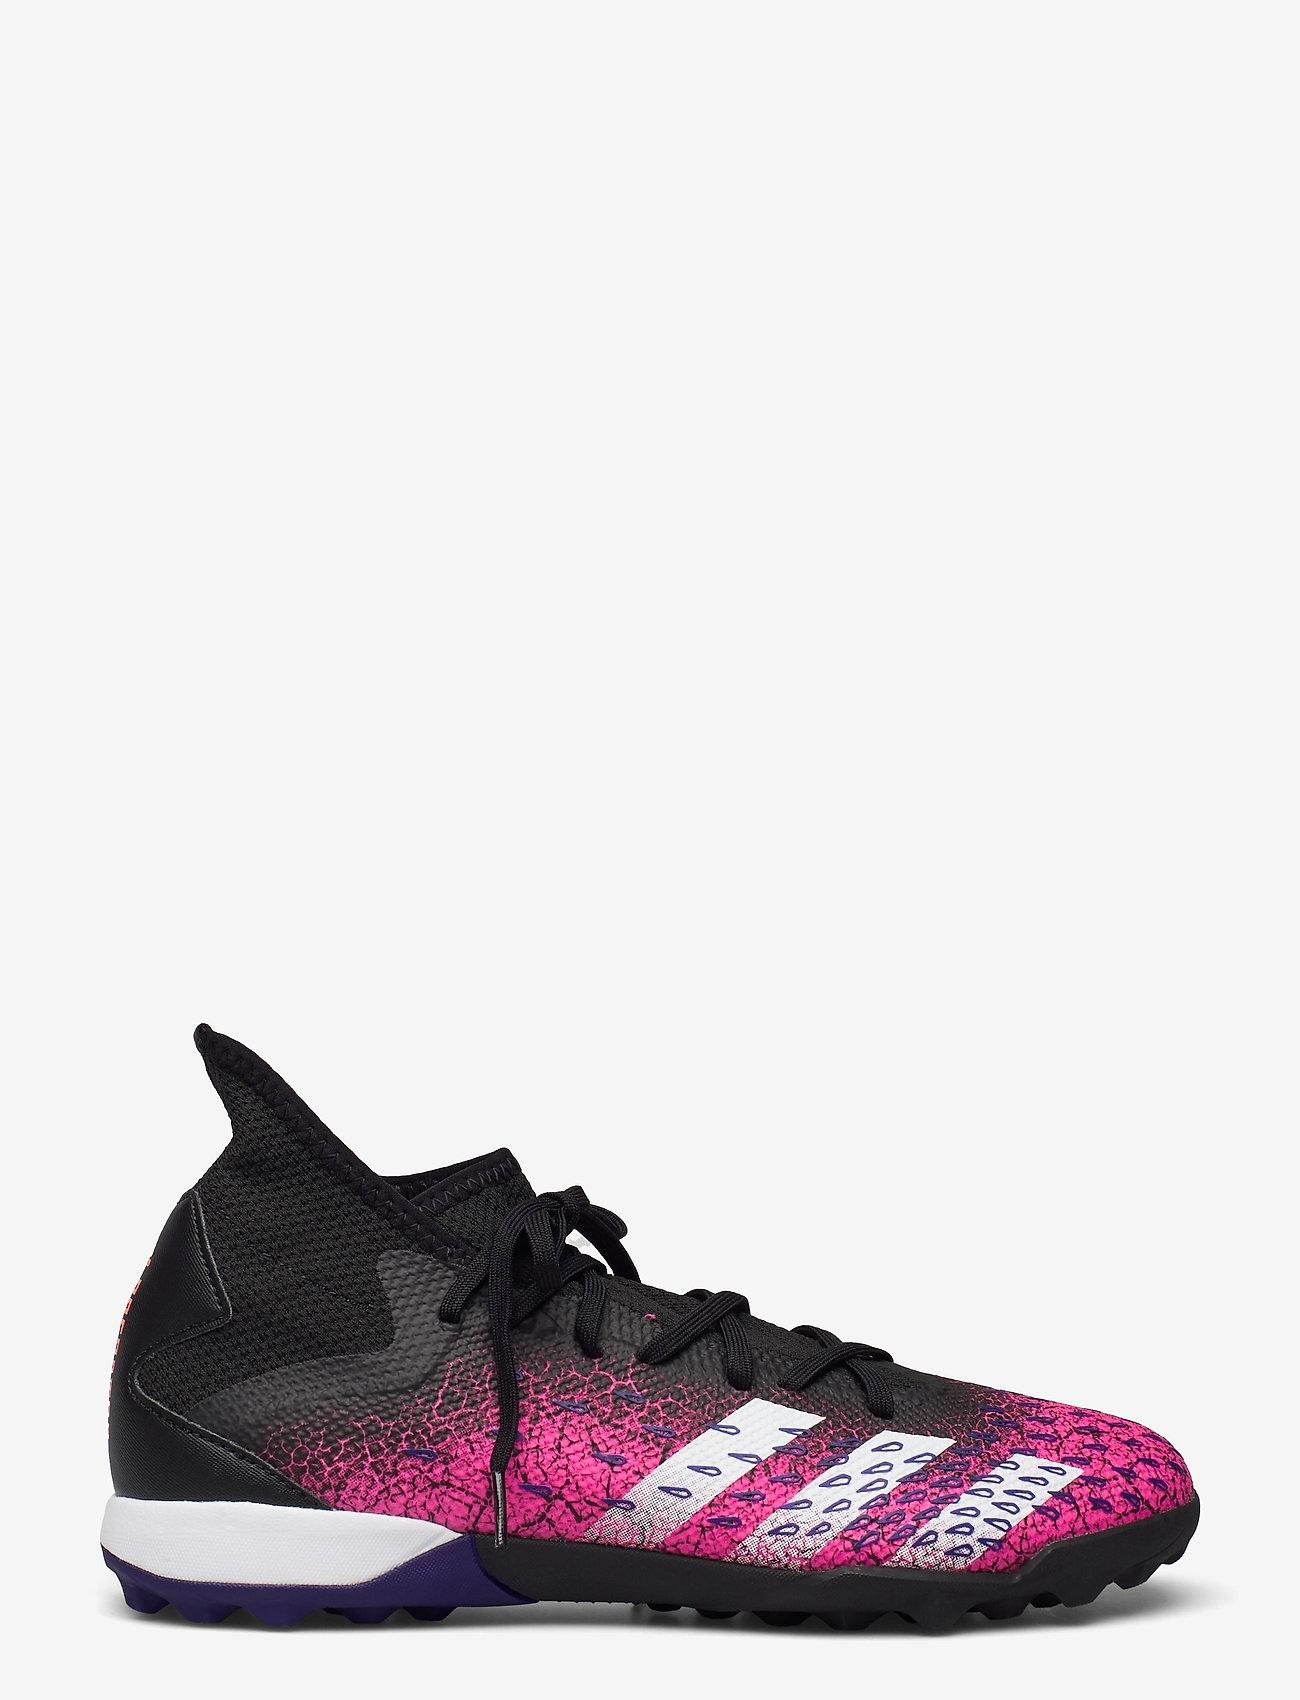 adidas Performance - Predator Freak.3 Turf Boots - fodboldsko - cblack/ftwwht/shopnk - 0